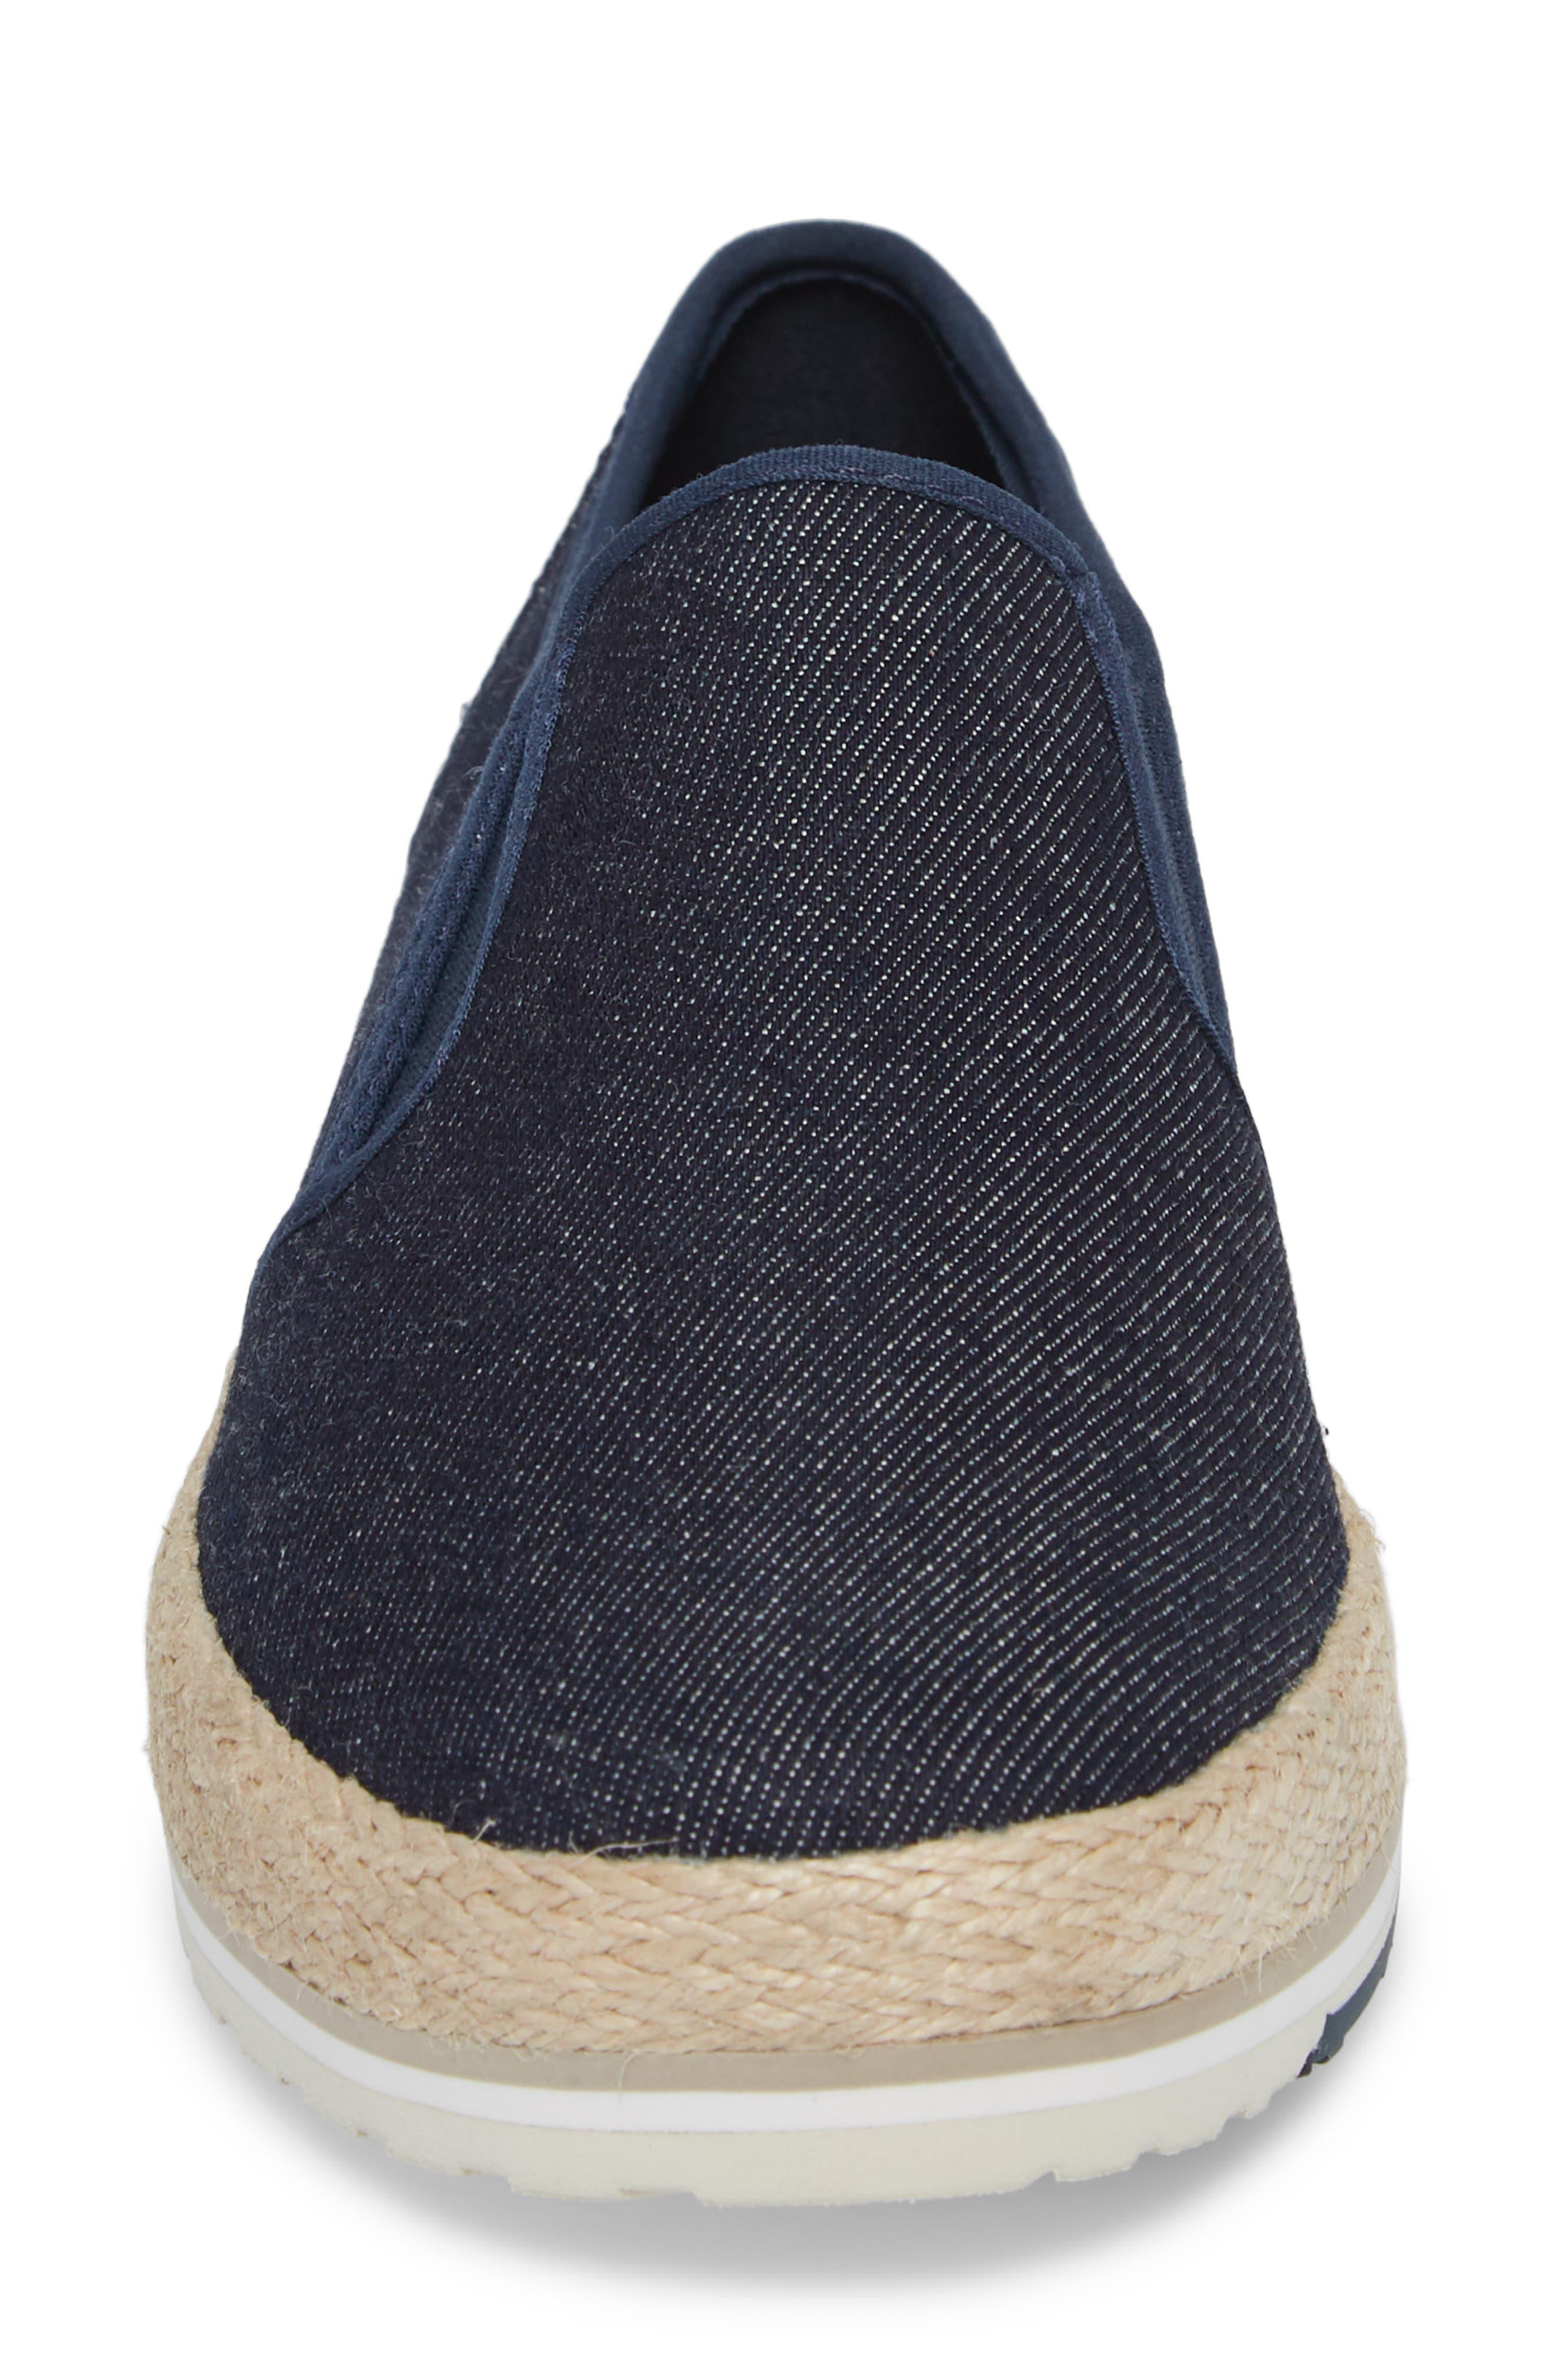 Eivissa Sea Slip-On Sneaker,                             Alternate thumbnail 4, color,                             Navy Canvas